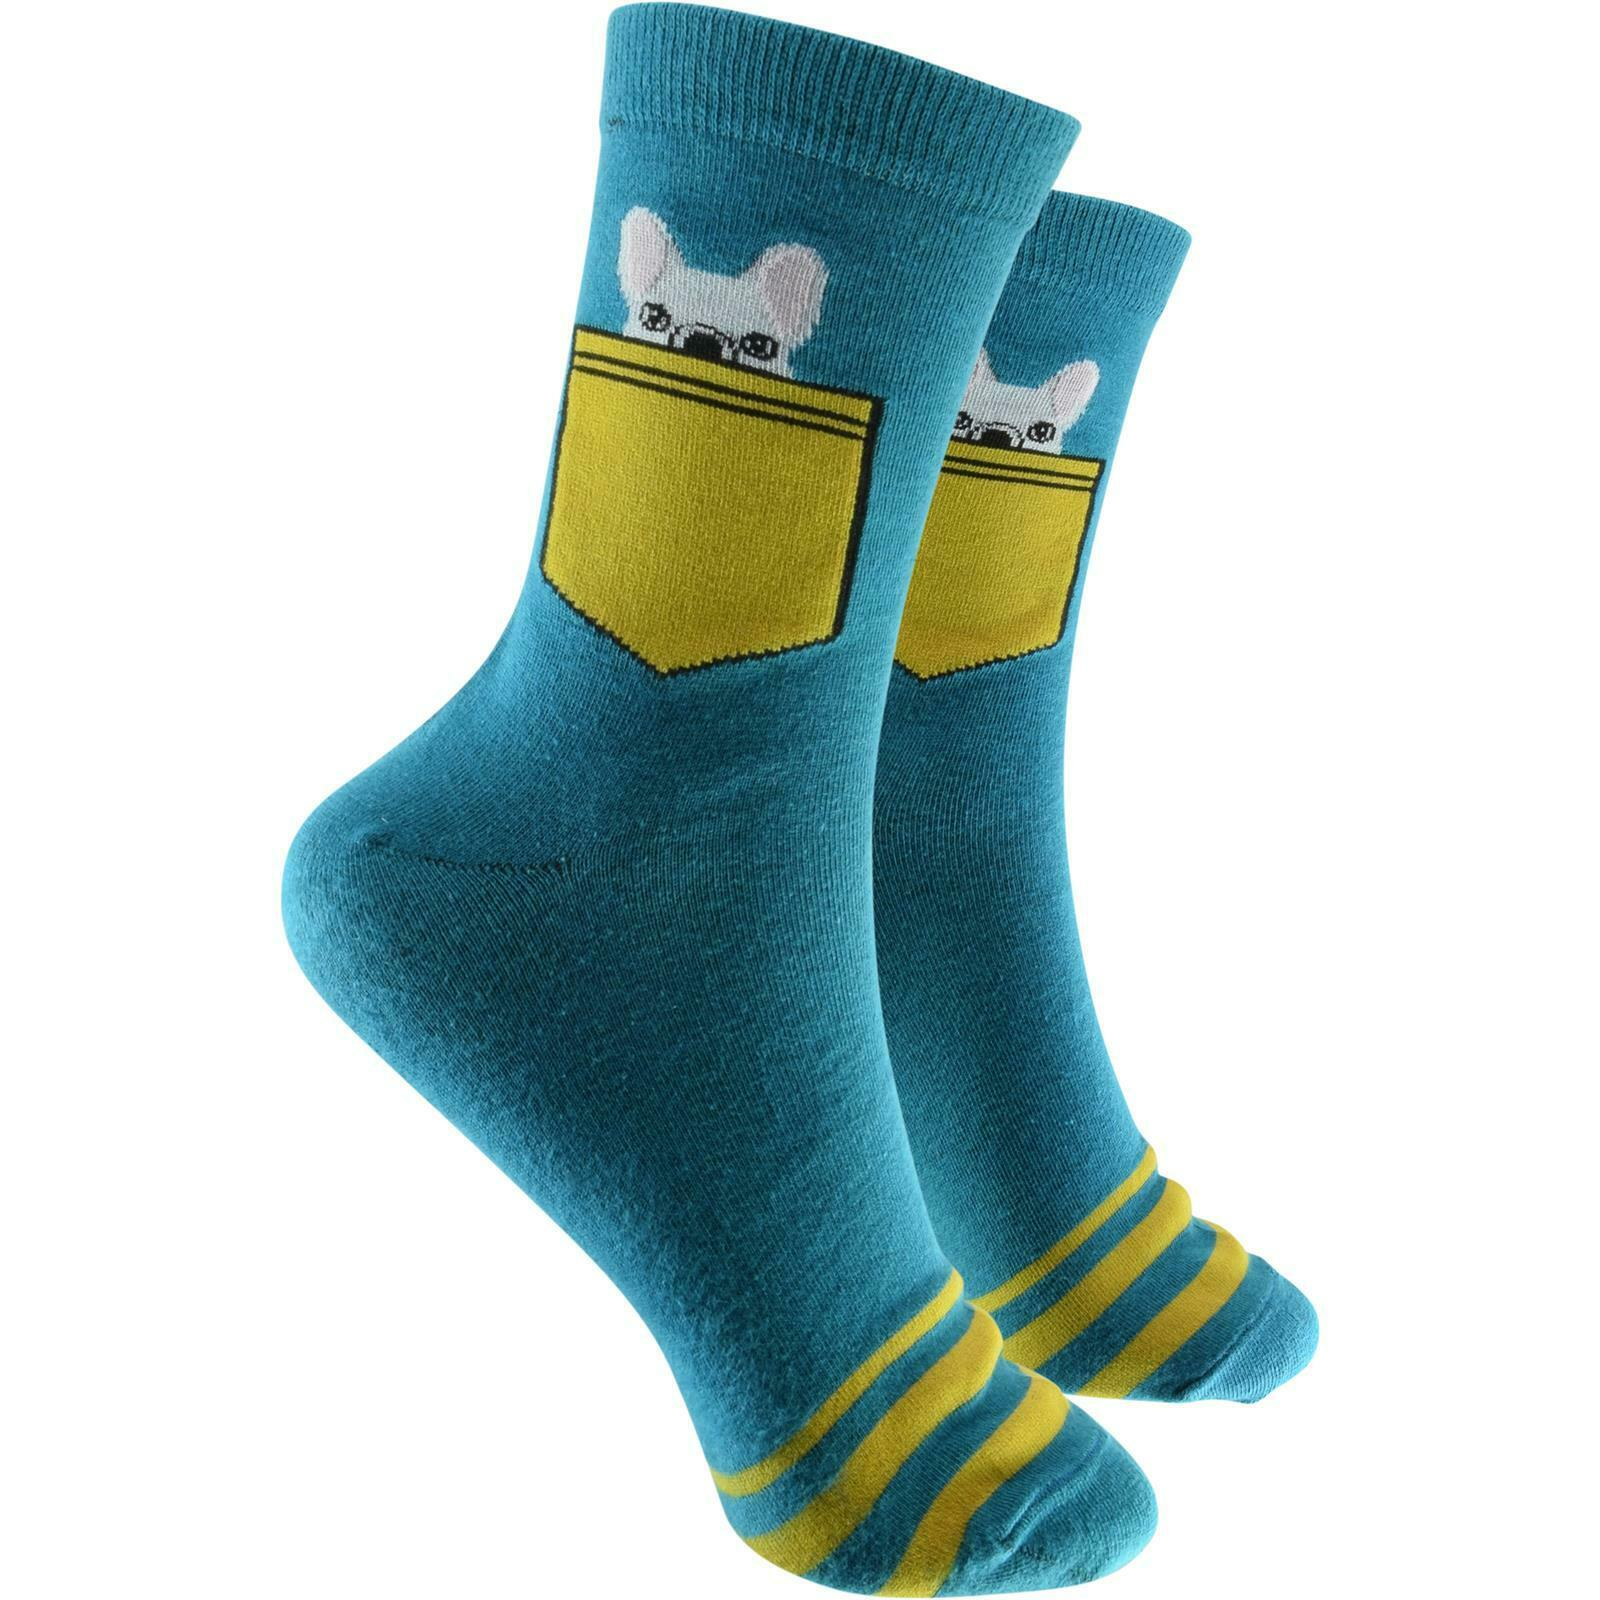 cosey dünne Socken – Bulldogge türkis 40-45 2 Paar Baumwolle atmungsaktiv weich